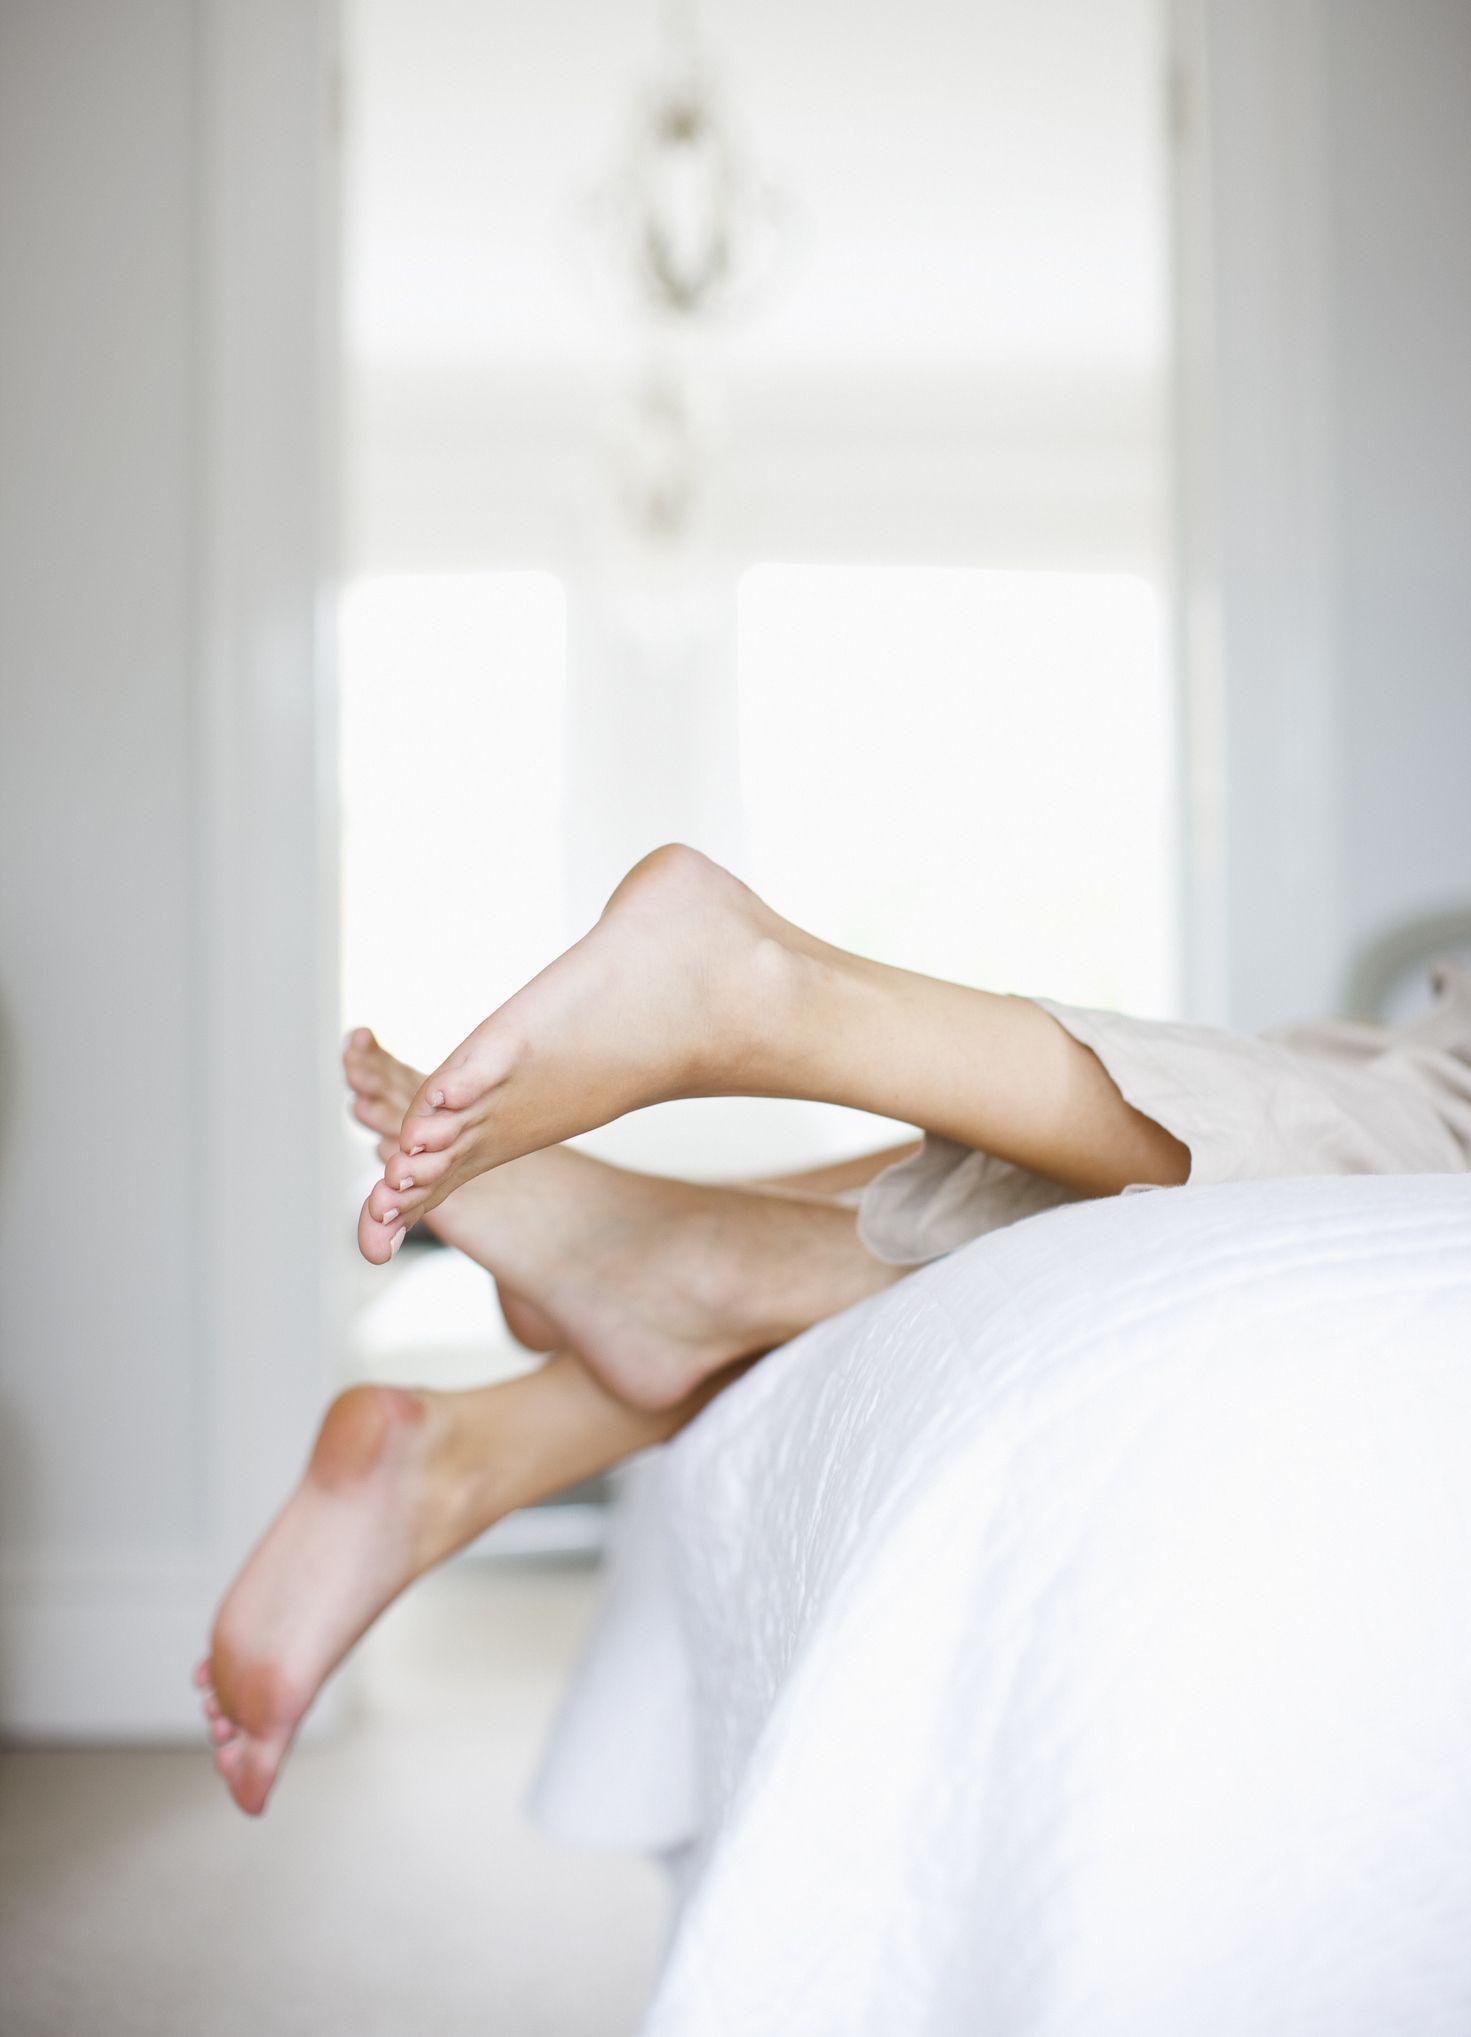 11 Ways Men Can Make Their Orgasms Even Better